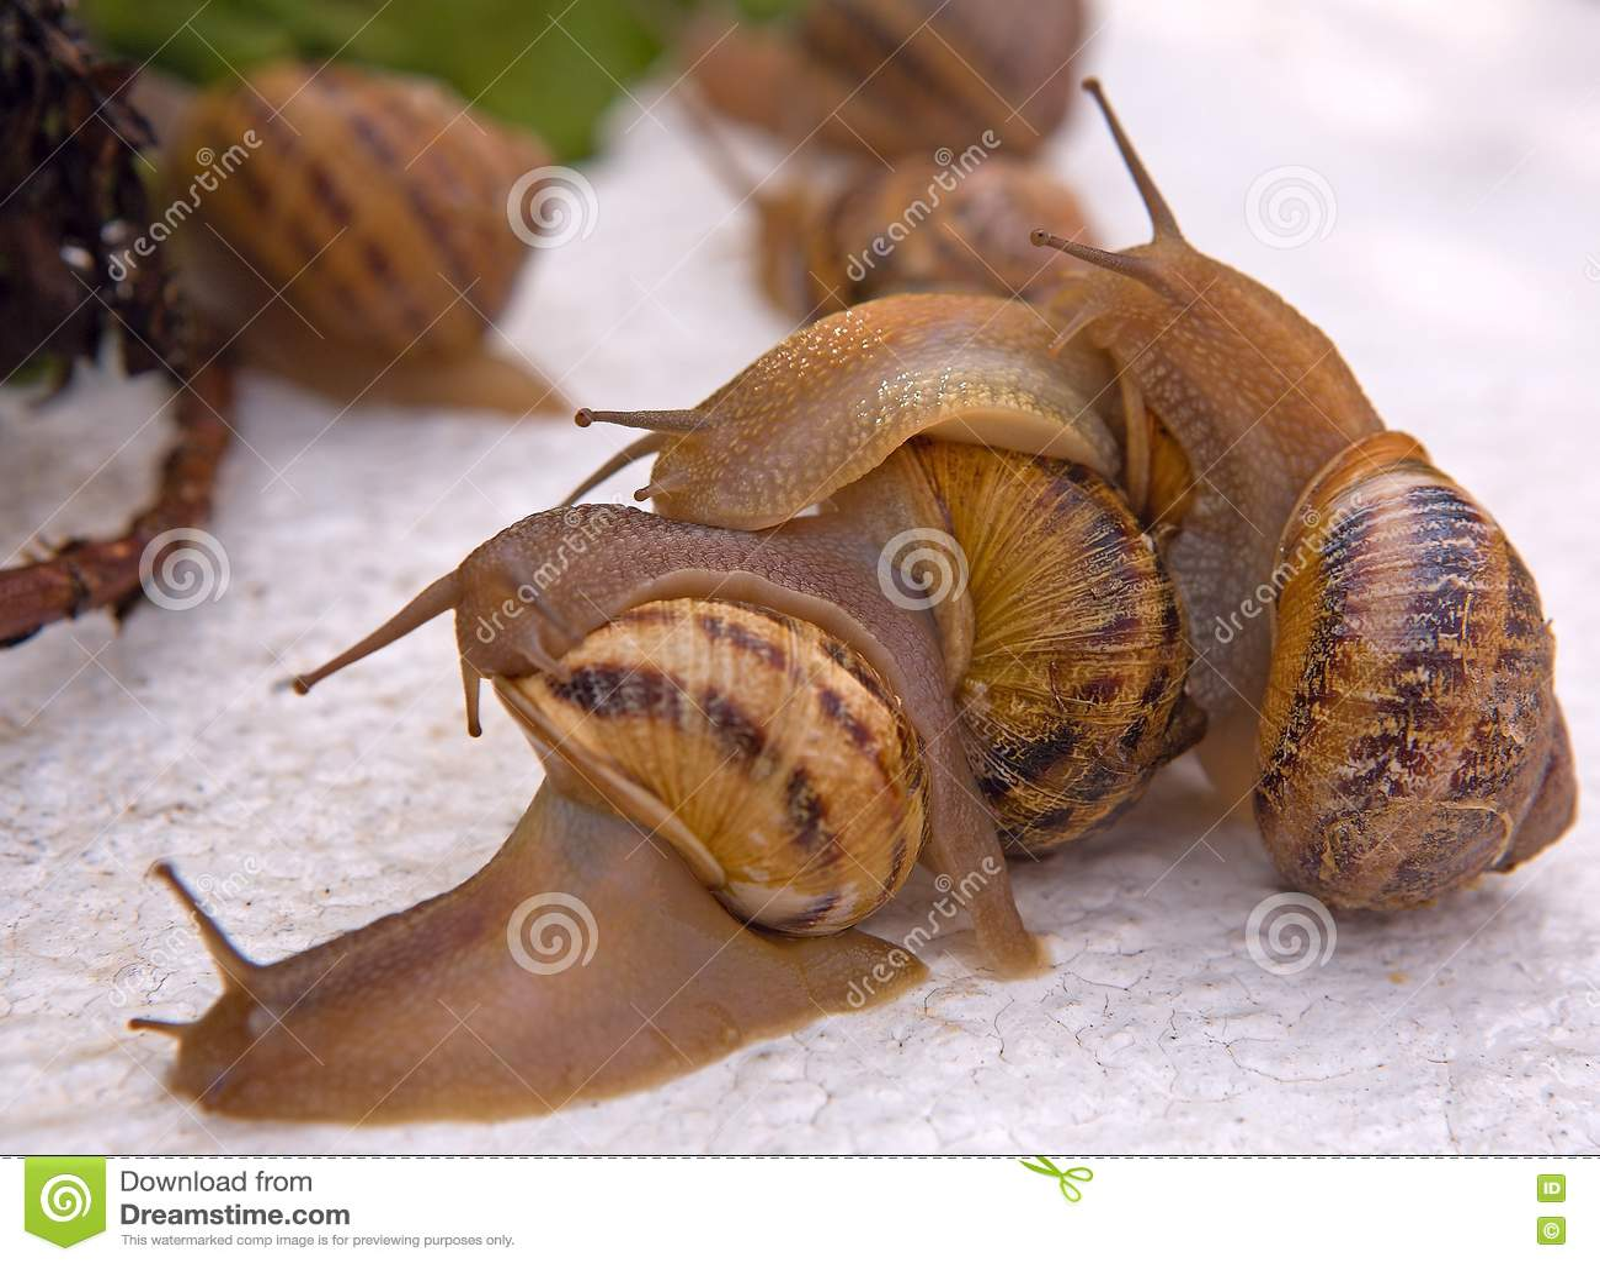 Tree snails after rain